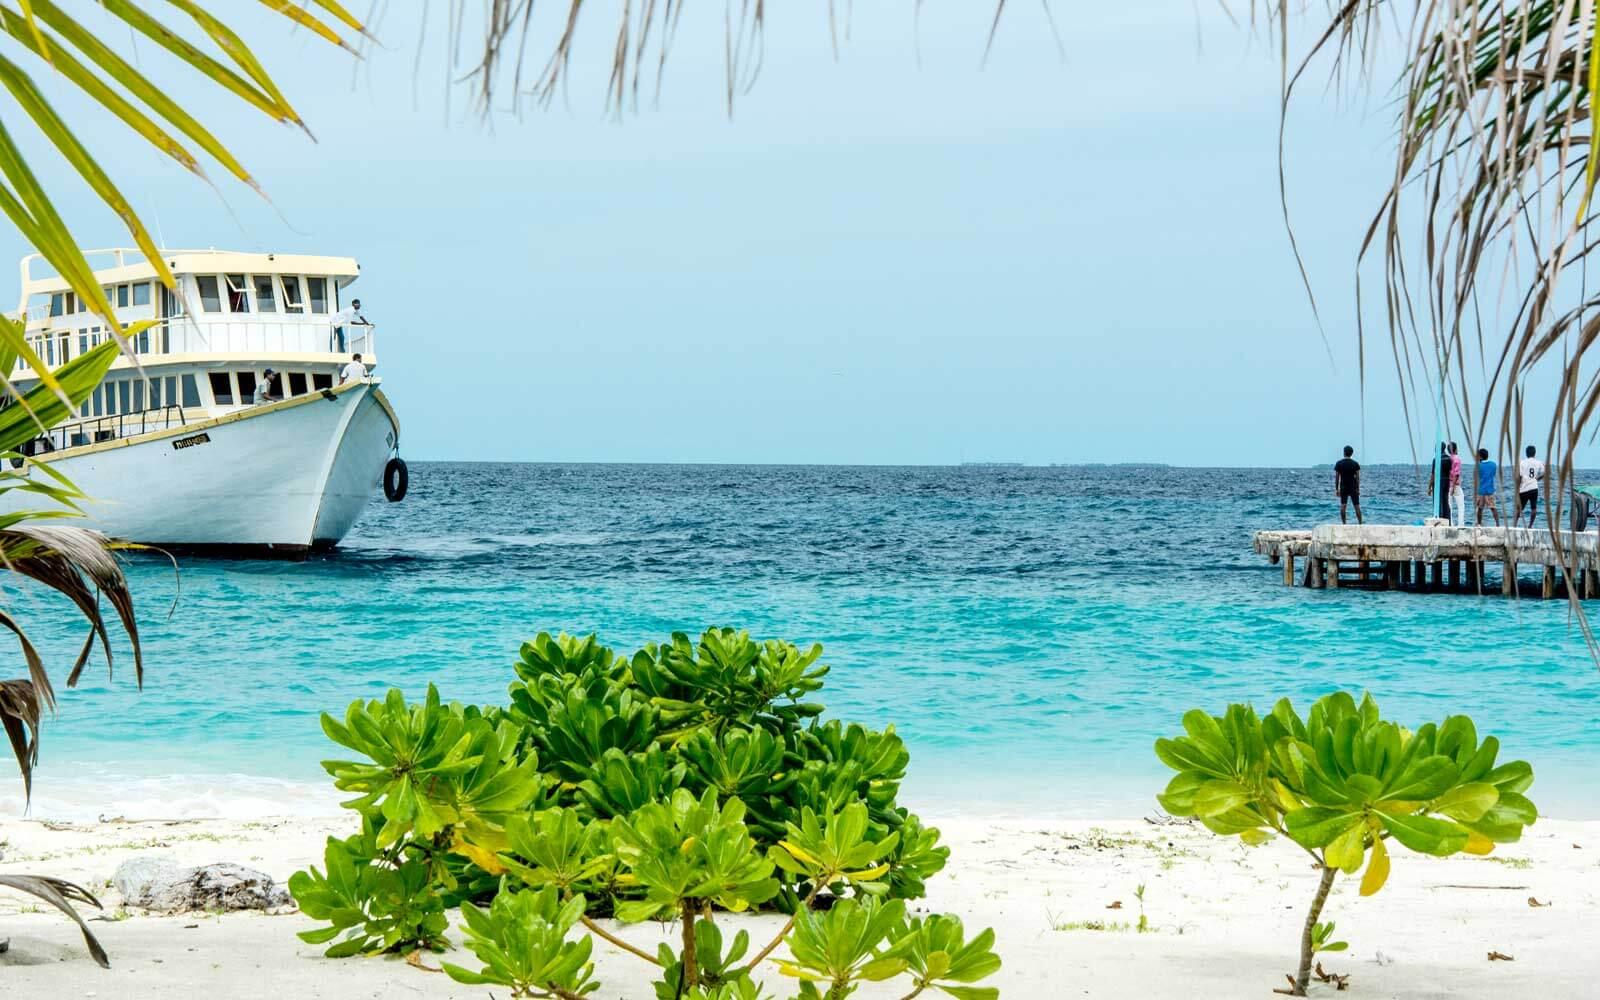 Honeymoon in Maldives-Maafushi island Holiday Travel & Tour Package